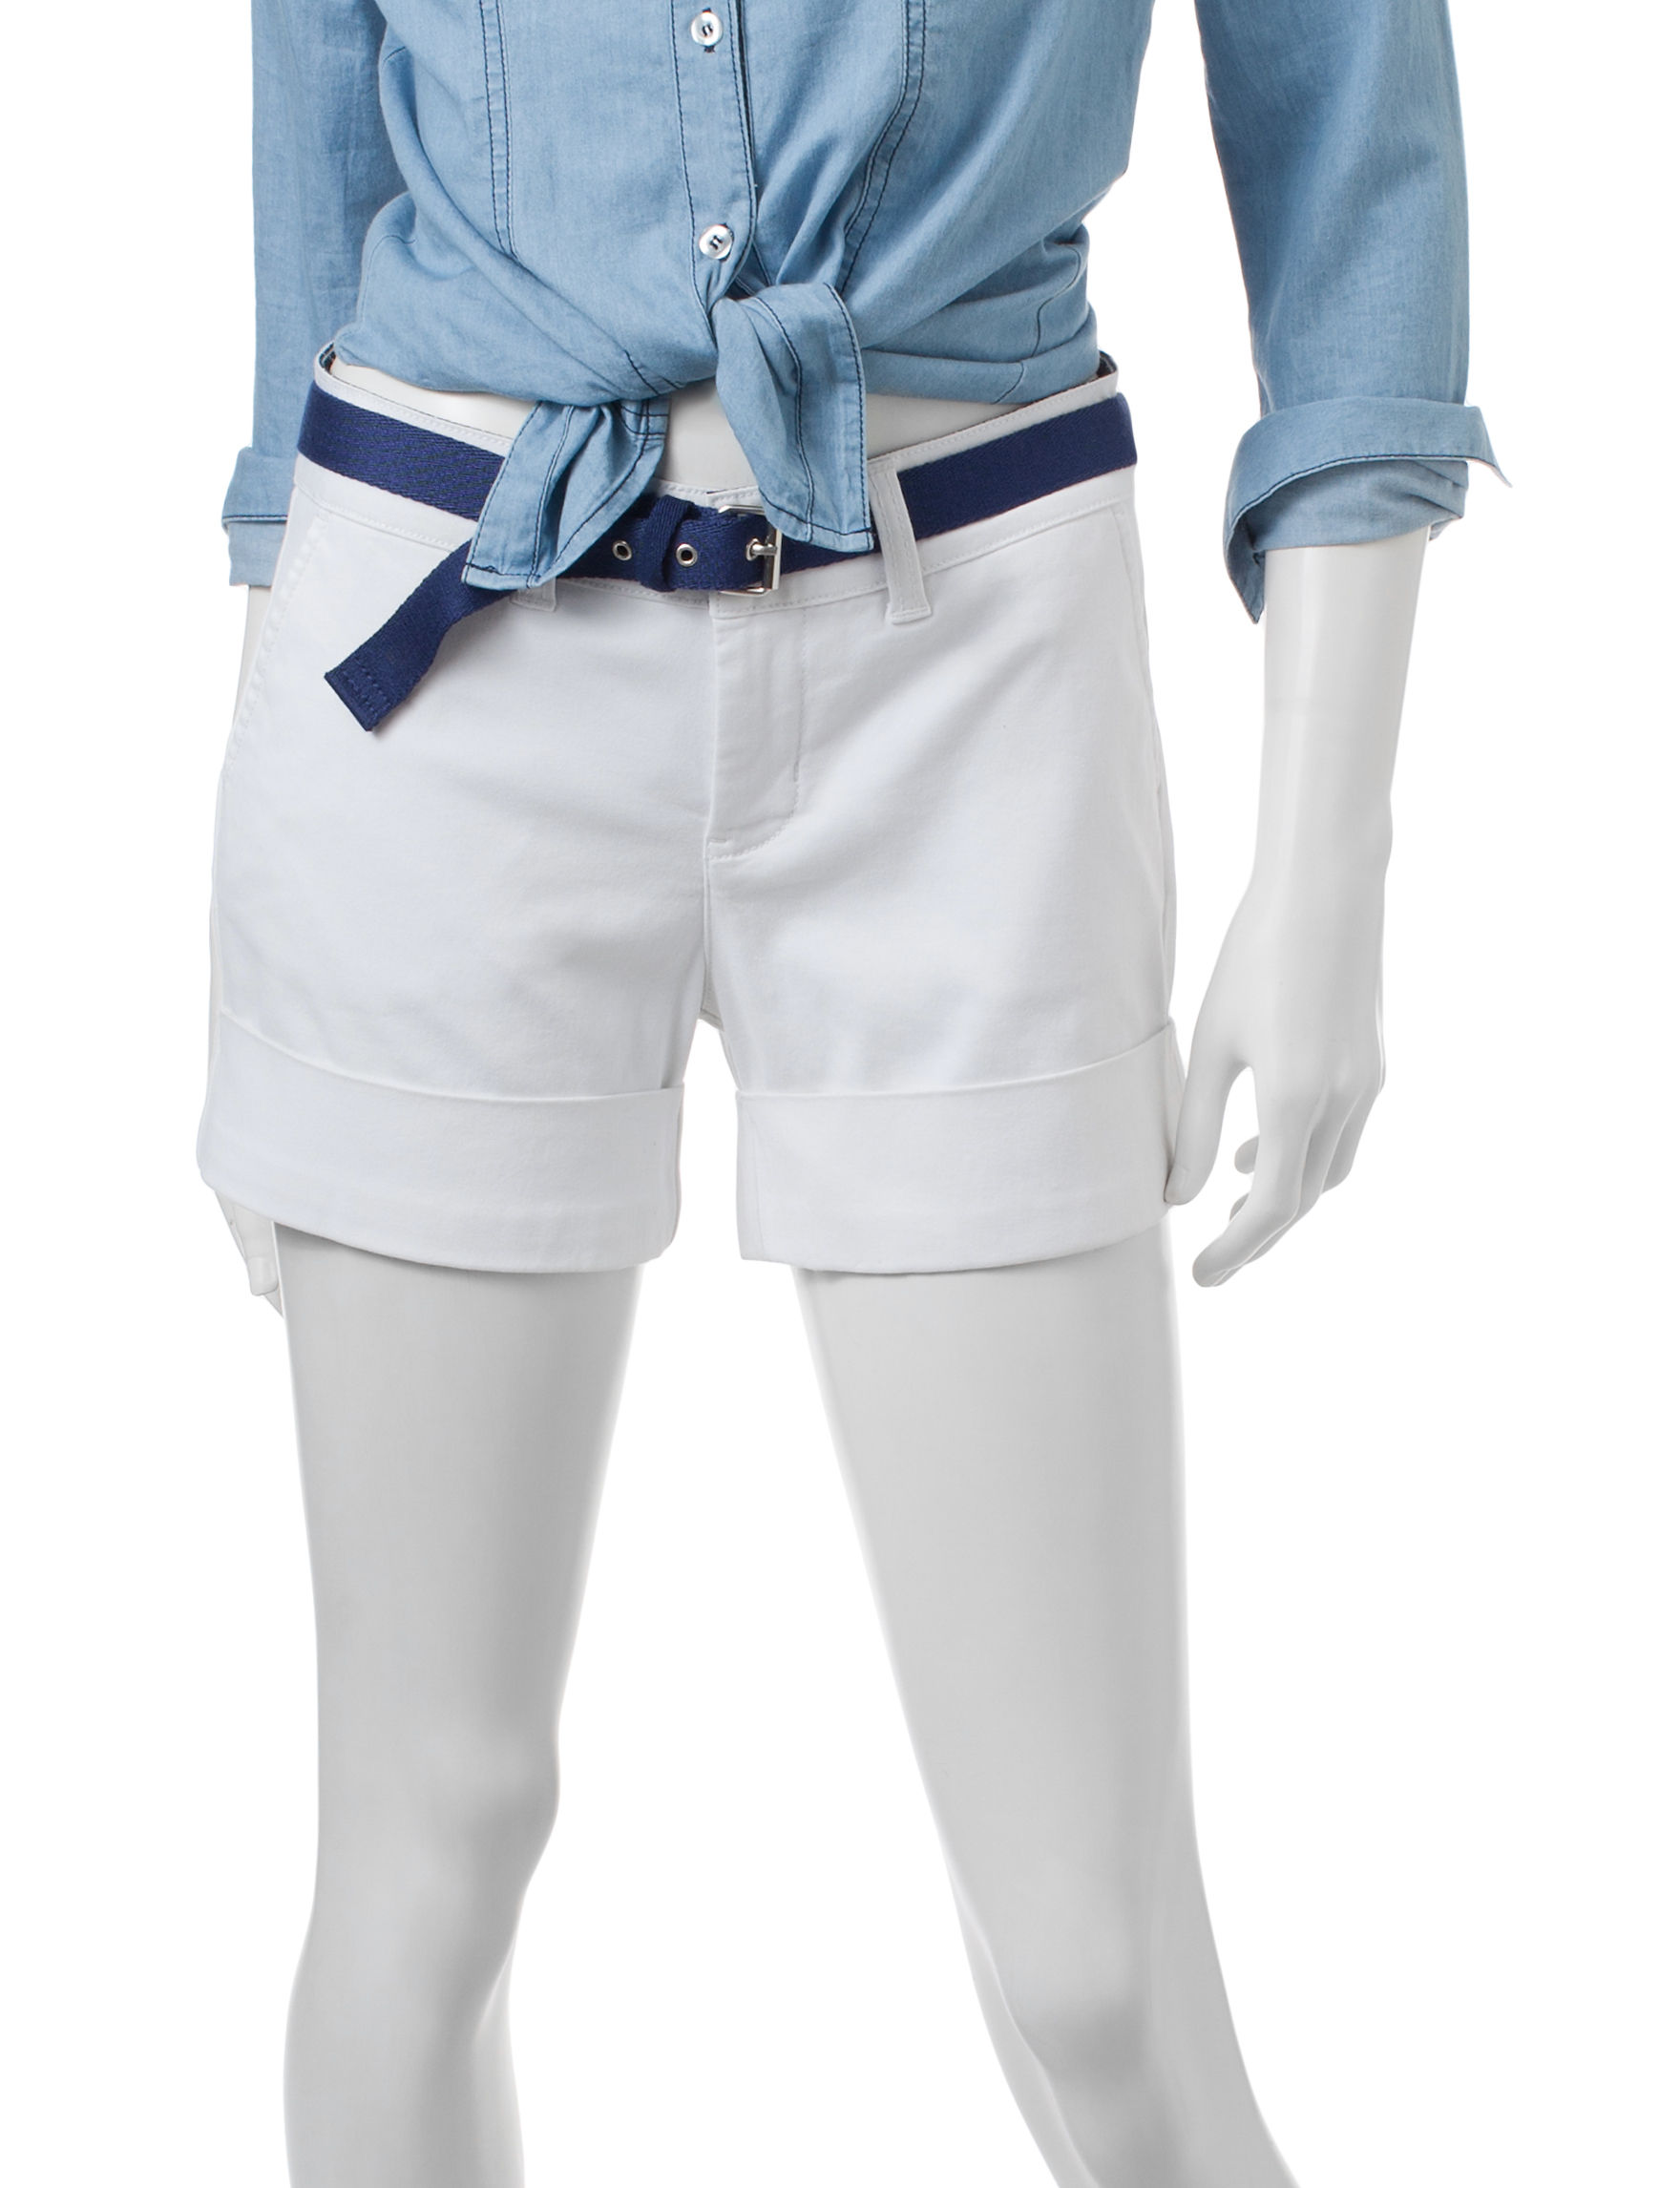 U.S. Polo Assn. White Classic